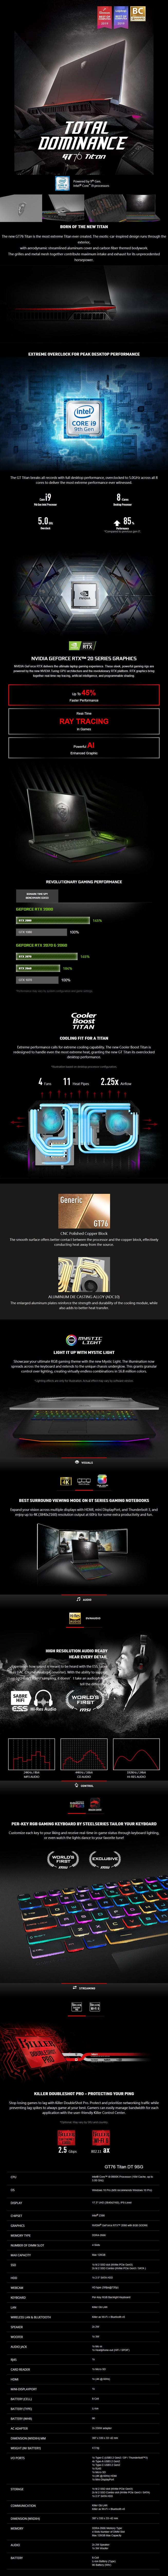 "MSI GT76 Titan DT 9SG 17.3"" Laptop i9-9900K 32GB 1TB RTX2080 Win 10 Pro - Overview 1"